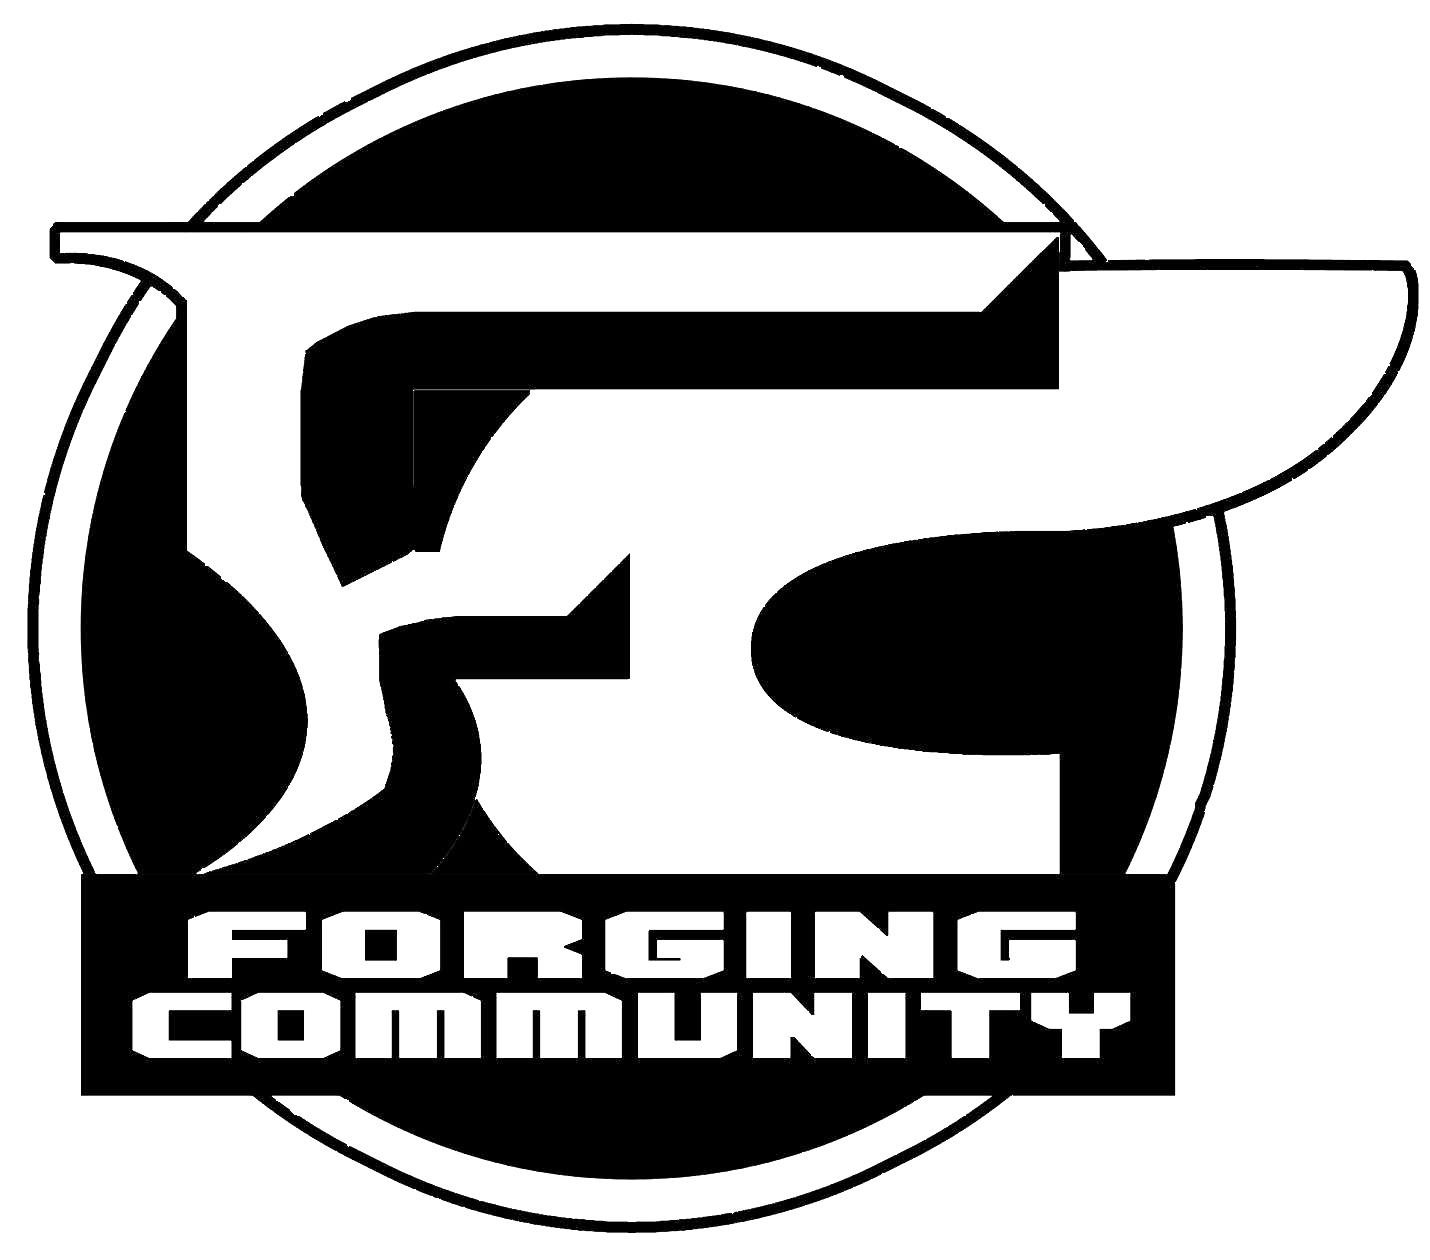 Duluth Forging Community